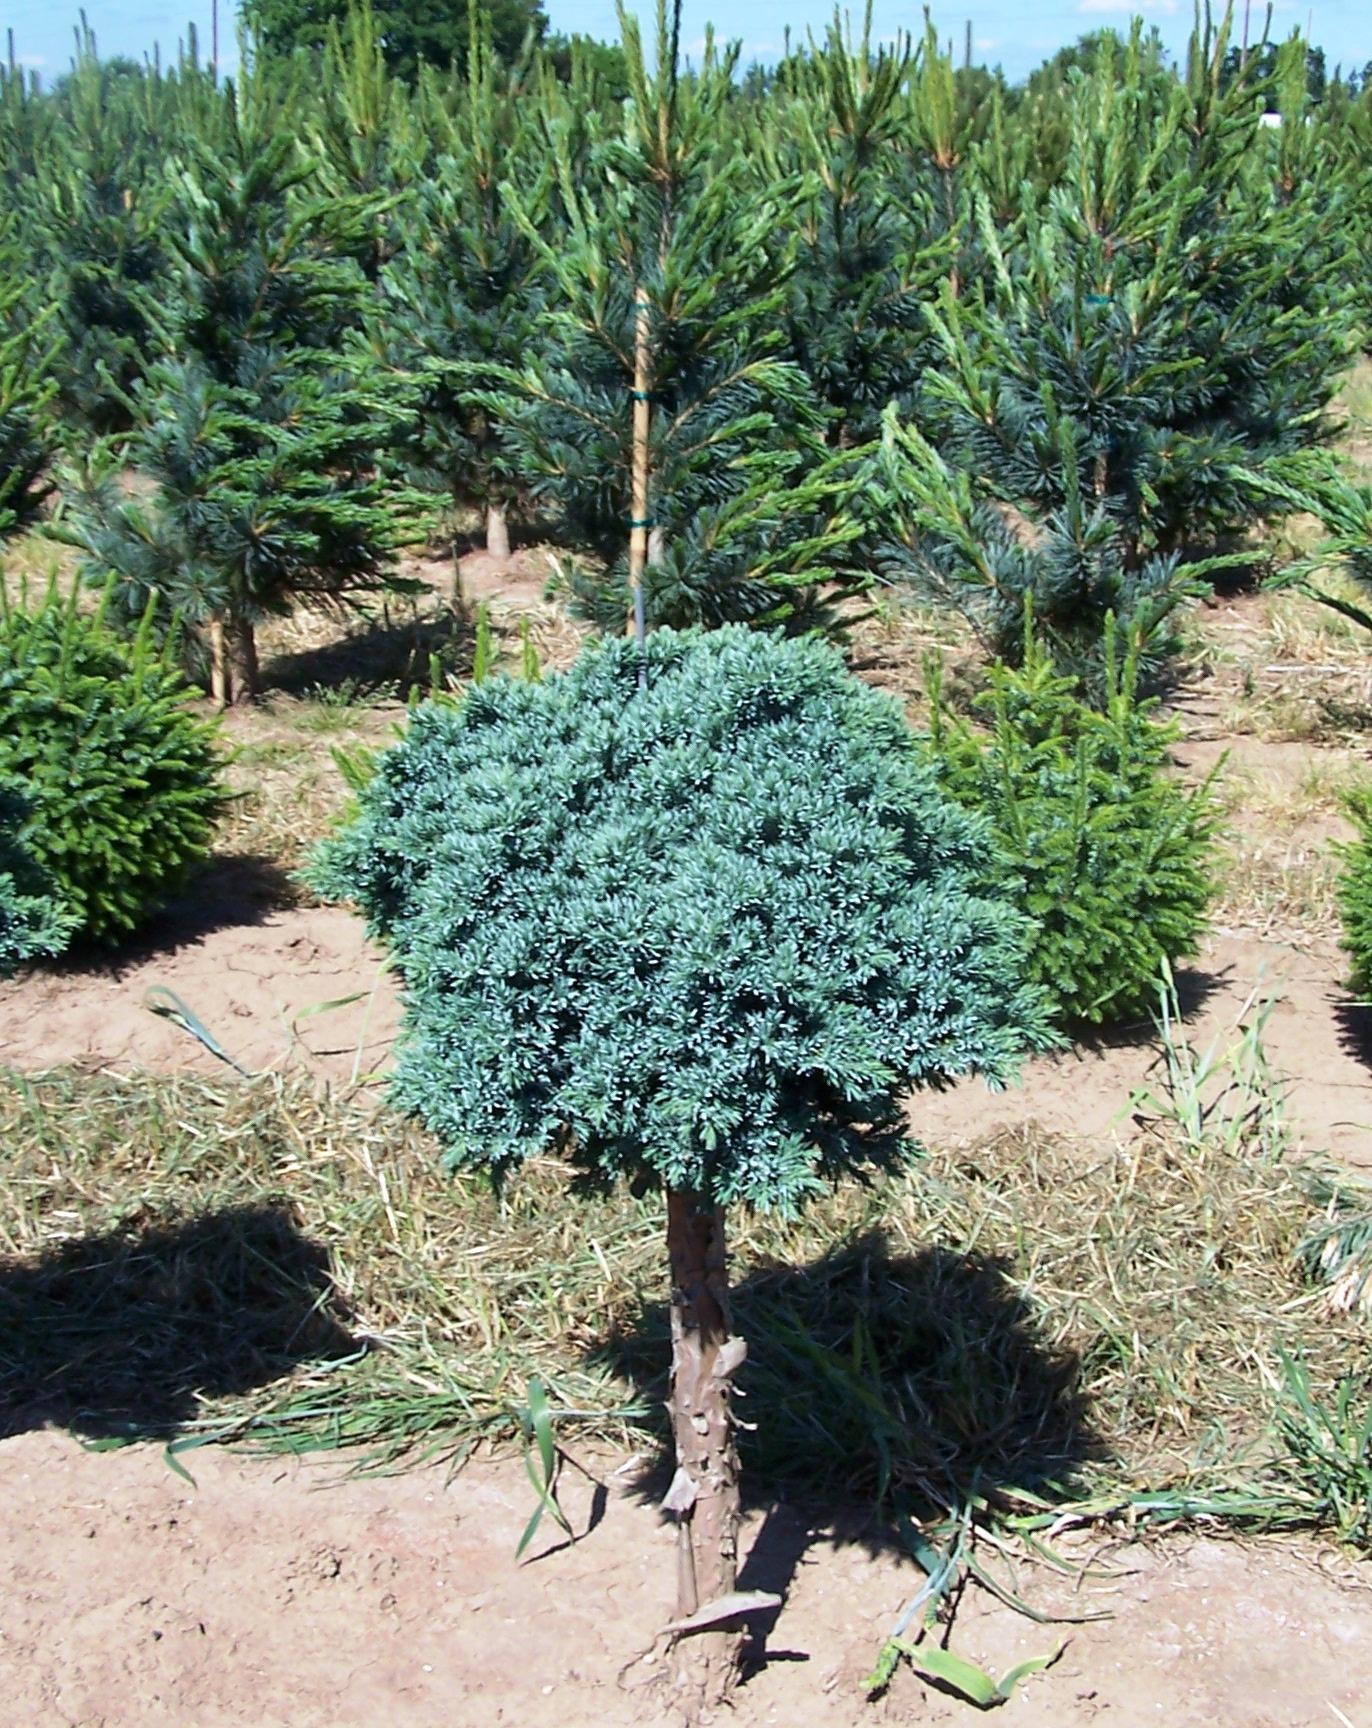 Blue chip juniper bing images for The juniper